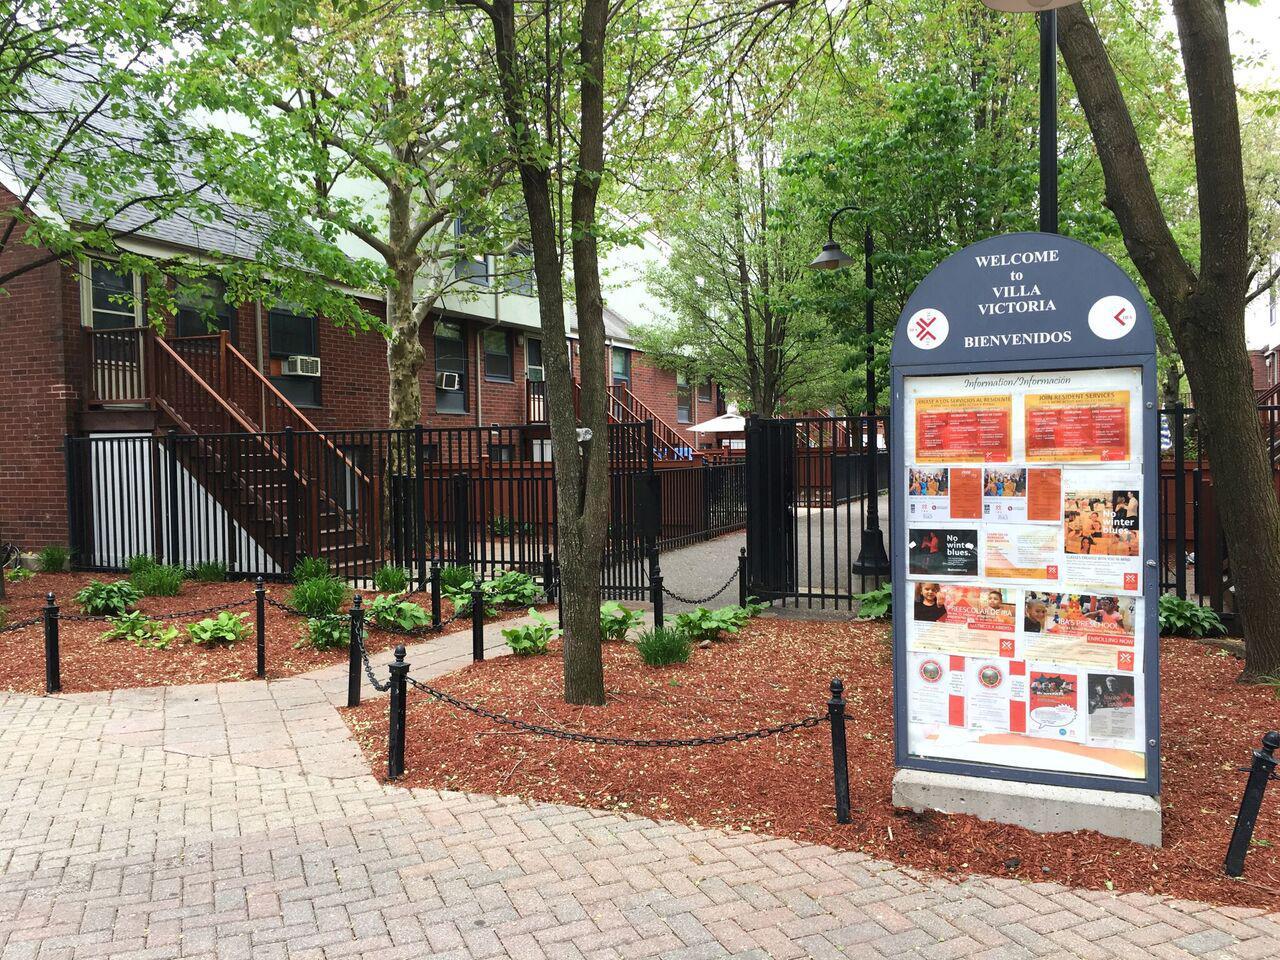 Villa Victoria Study Featured on Mayor Walsh's Reading List